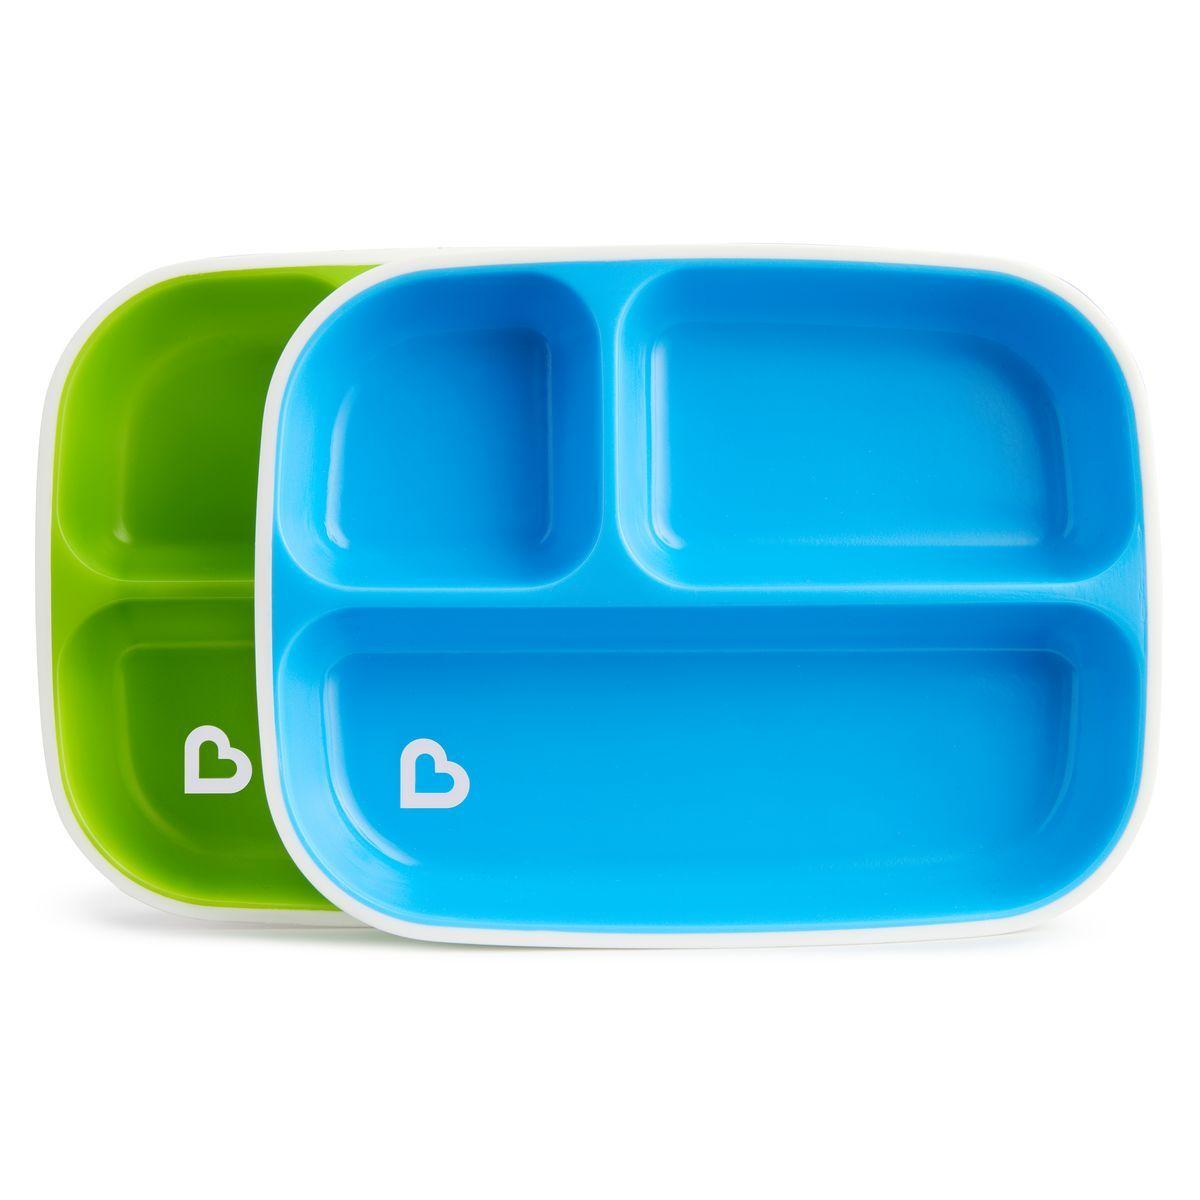 Набір тарілок Munchkin Splash Divided Plates, 2 шт.